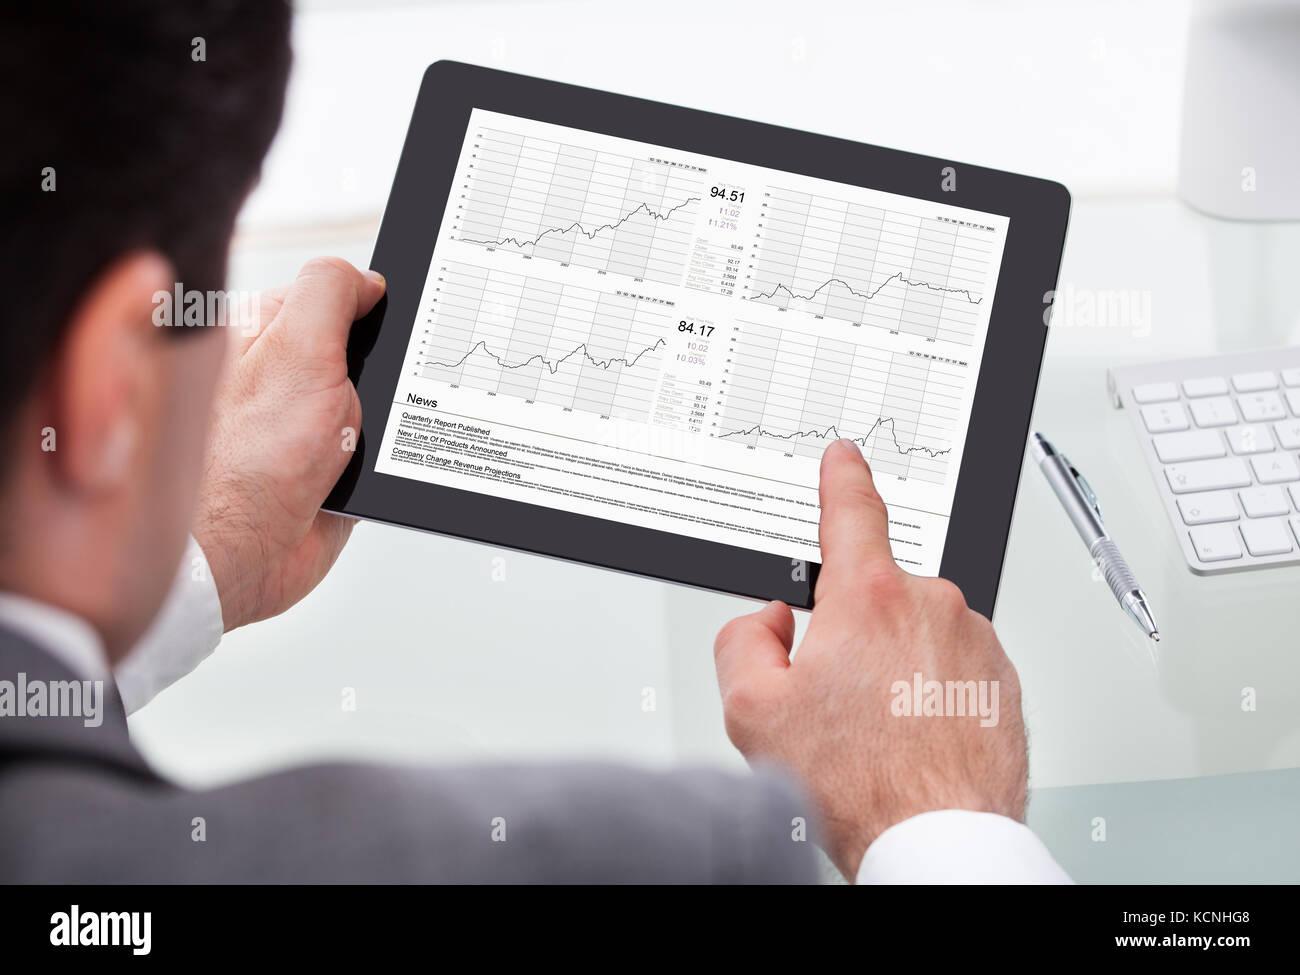 Close-up Of Businessman Analyzing Stock Market Status On Digital Tablet - Stock Image